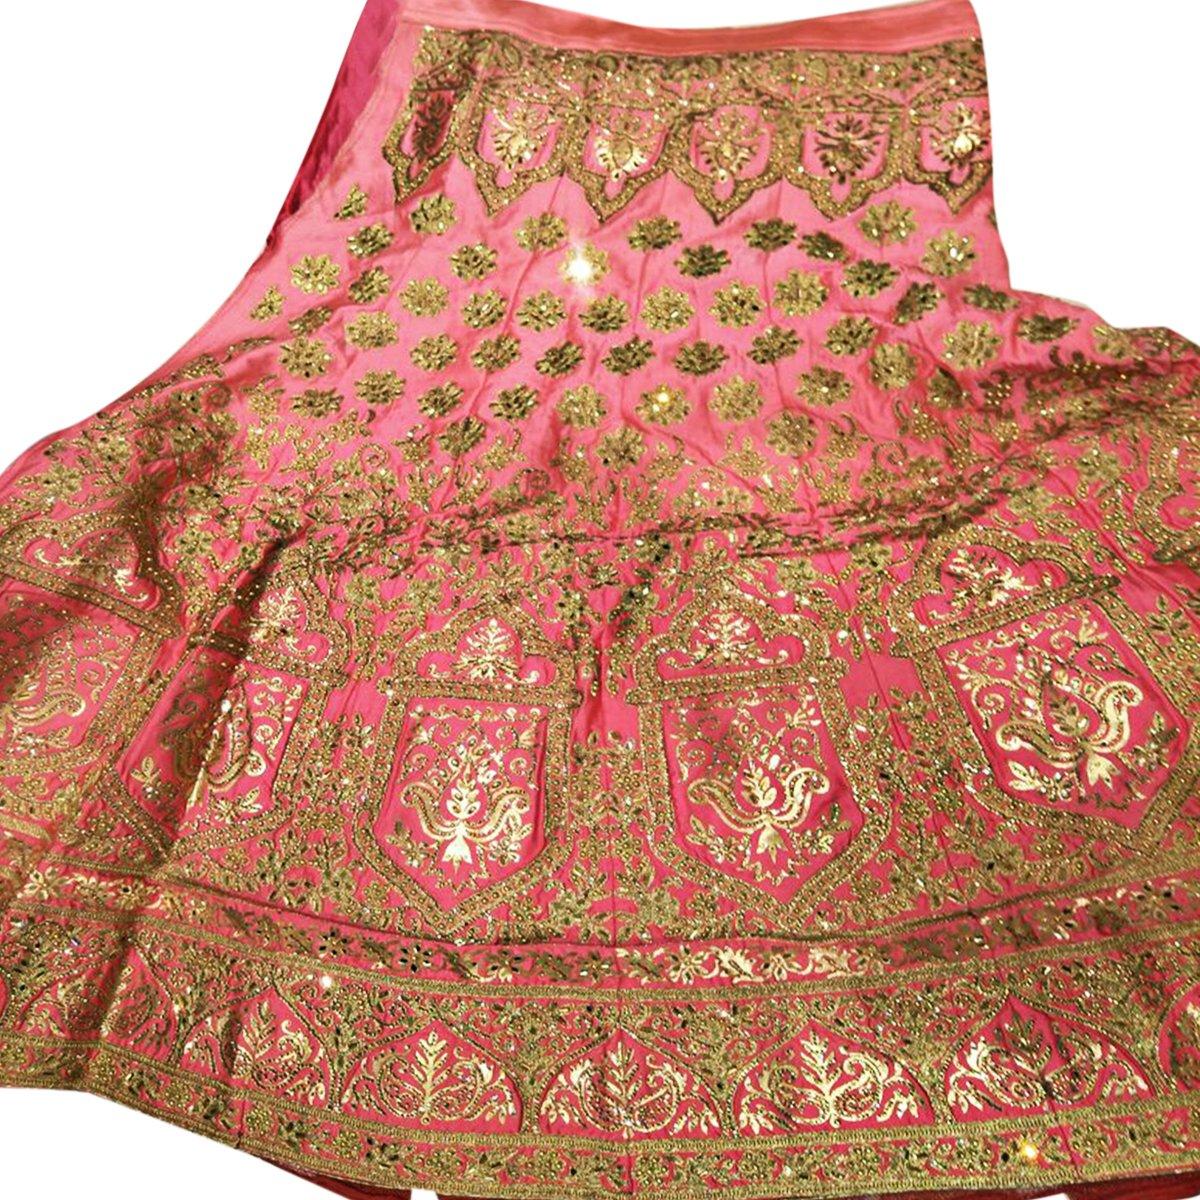 New Designer Ethnic Heavy Indian Bridal Wedding Women Lehenga Choli Anarkali Salwar Chaniya Choli By Balaji Emporium 608 80